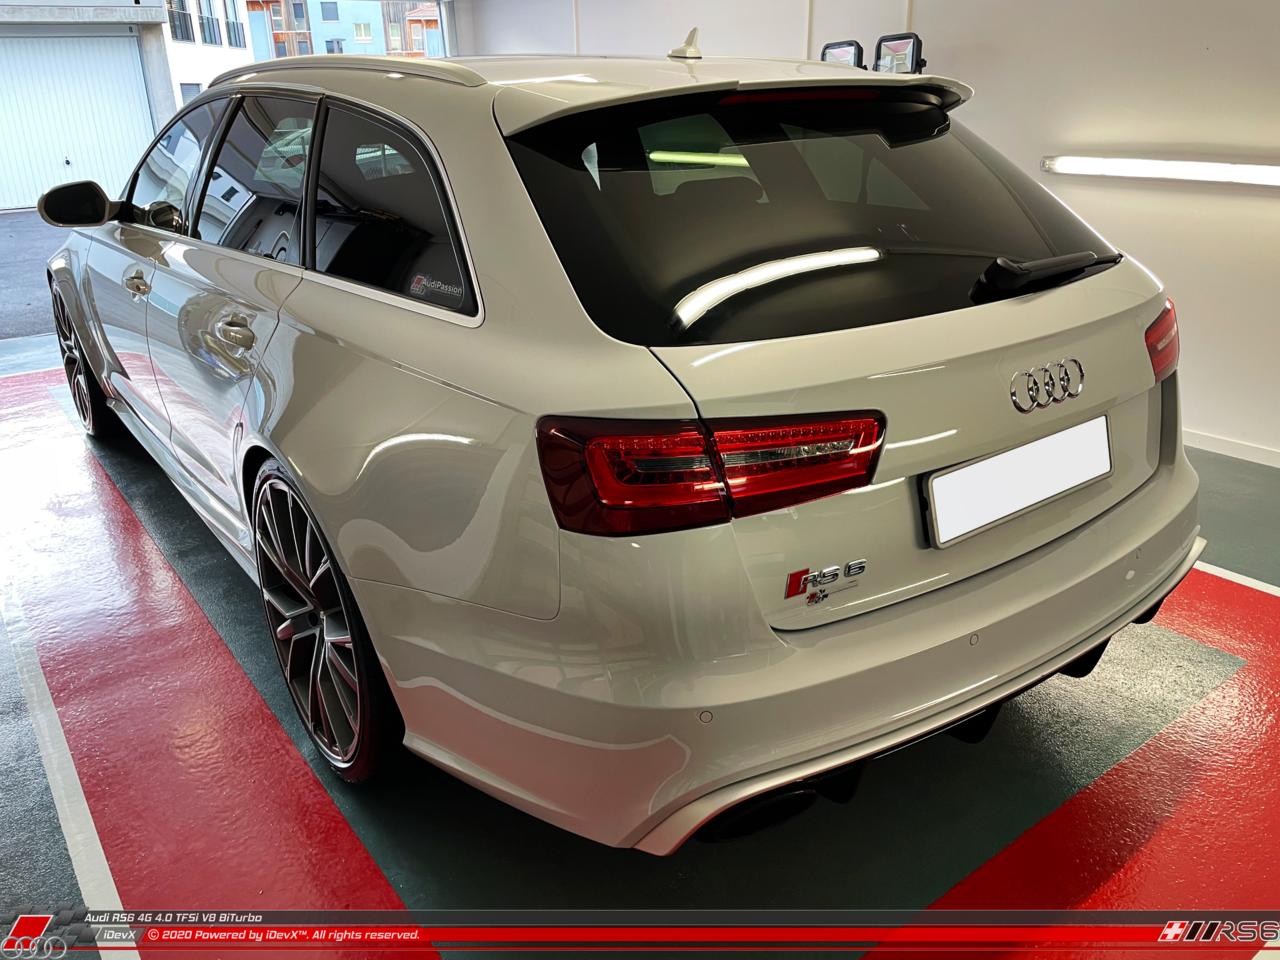 19.02.2021_Audi-RS6_iDevX_005.png